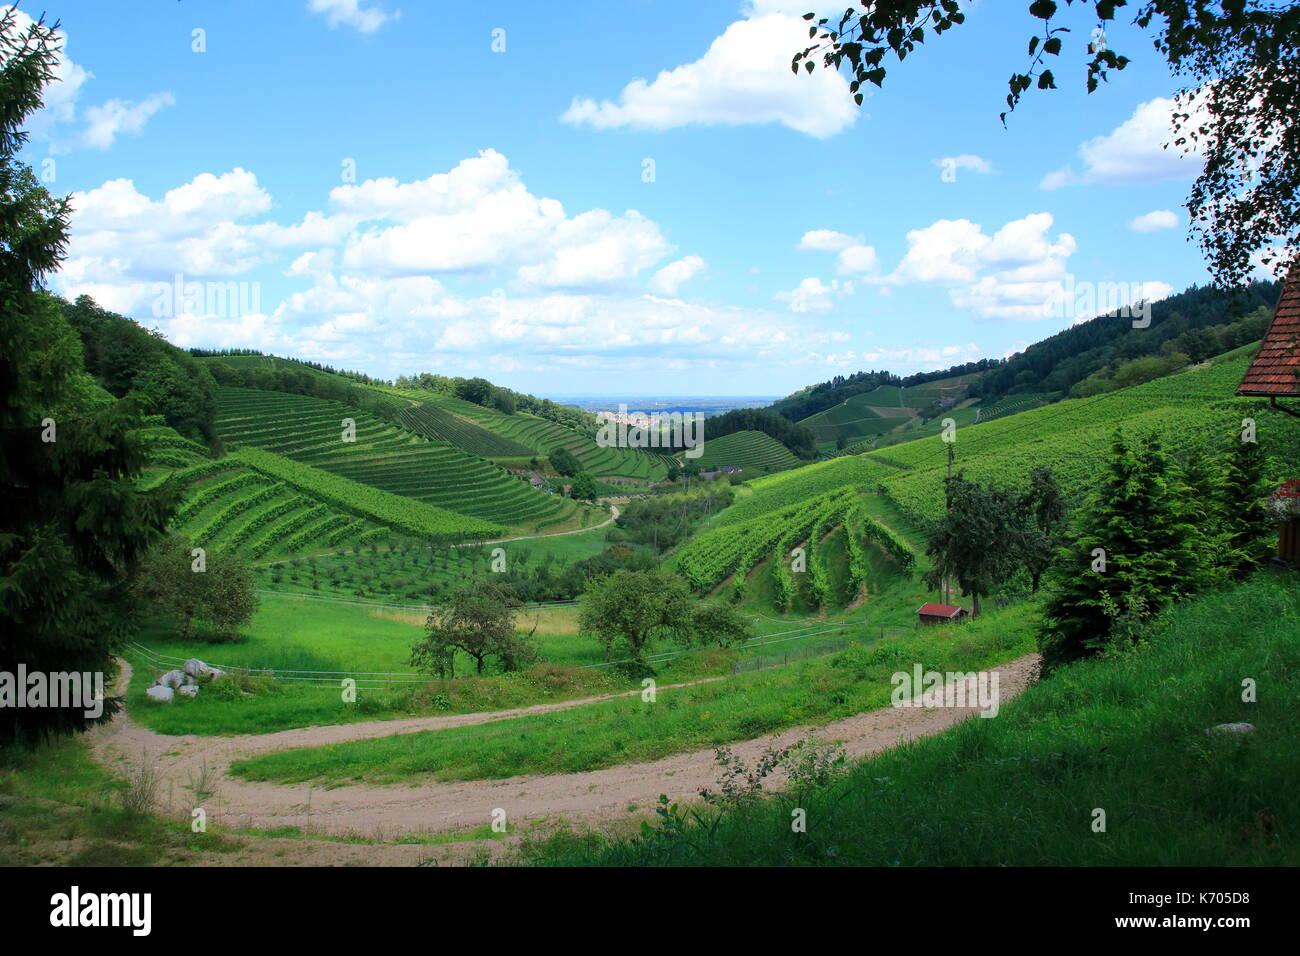 Blick über Reben in Bottenau, Ortenberg im Ortenaukreis, Schwarzwald Stockbild